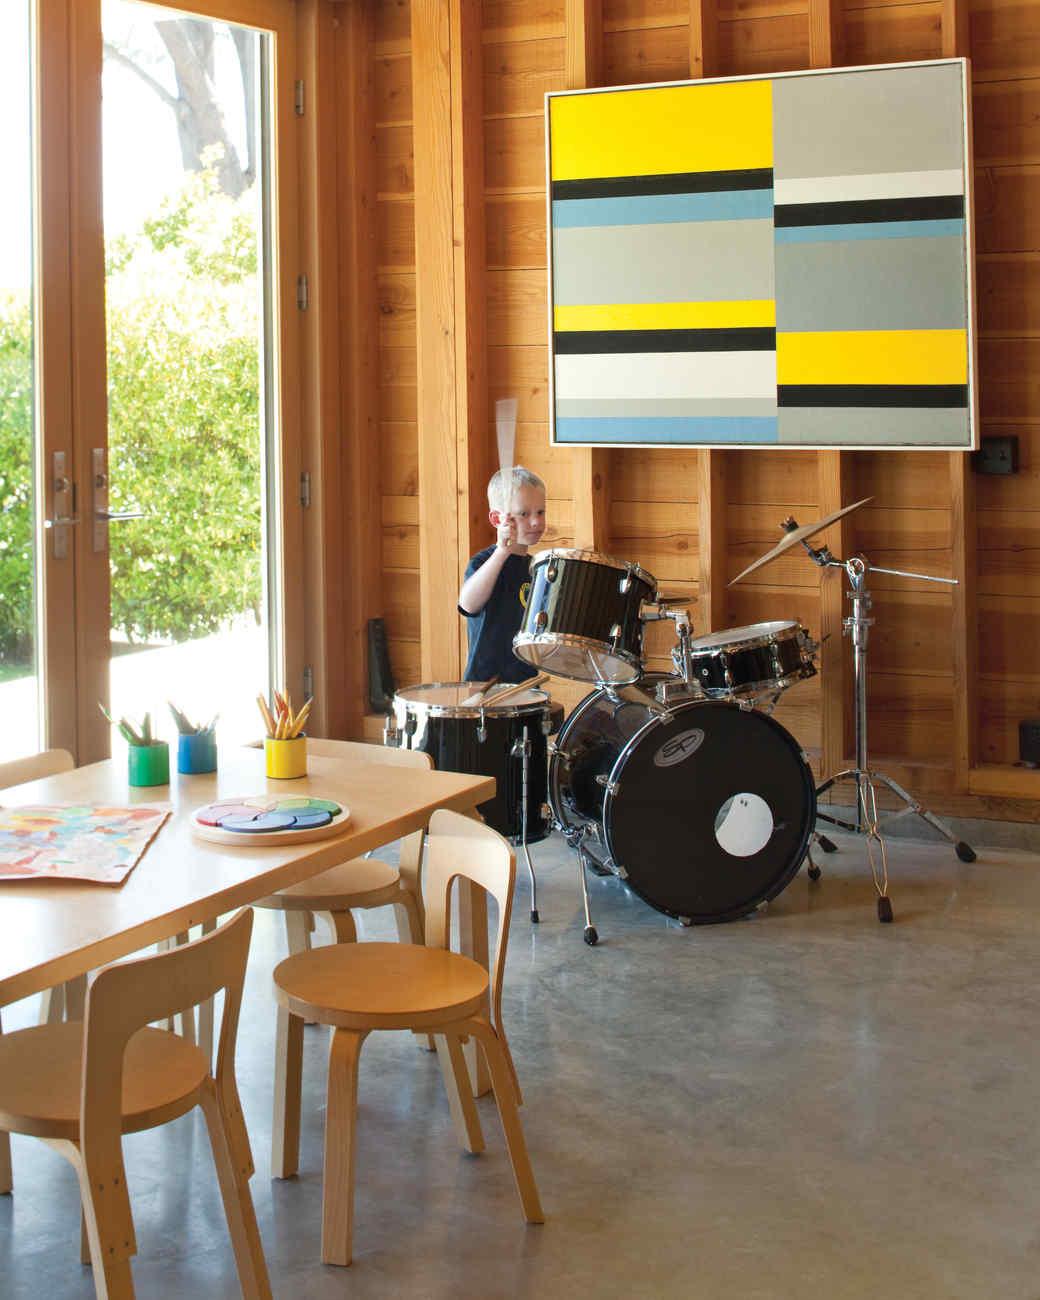 beach-house-drums-0811mld107442.jpg